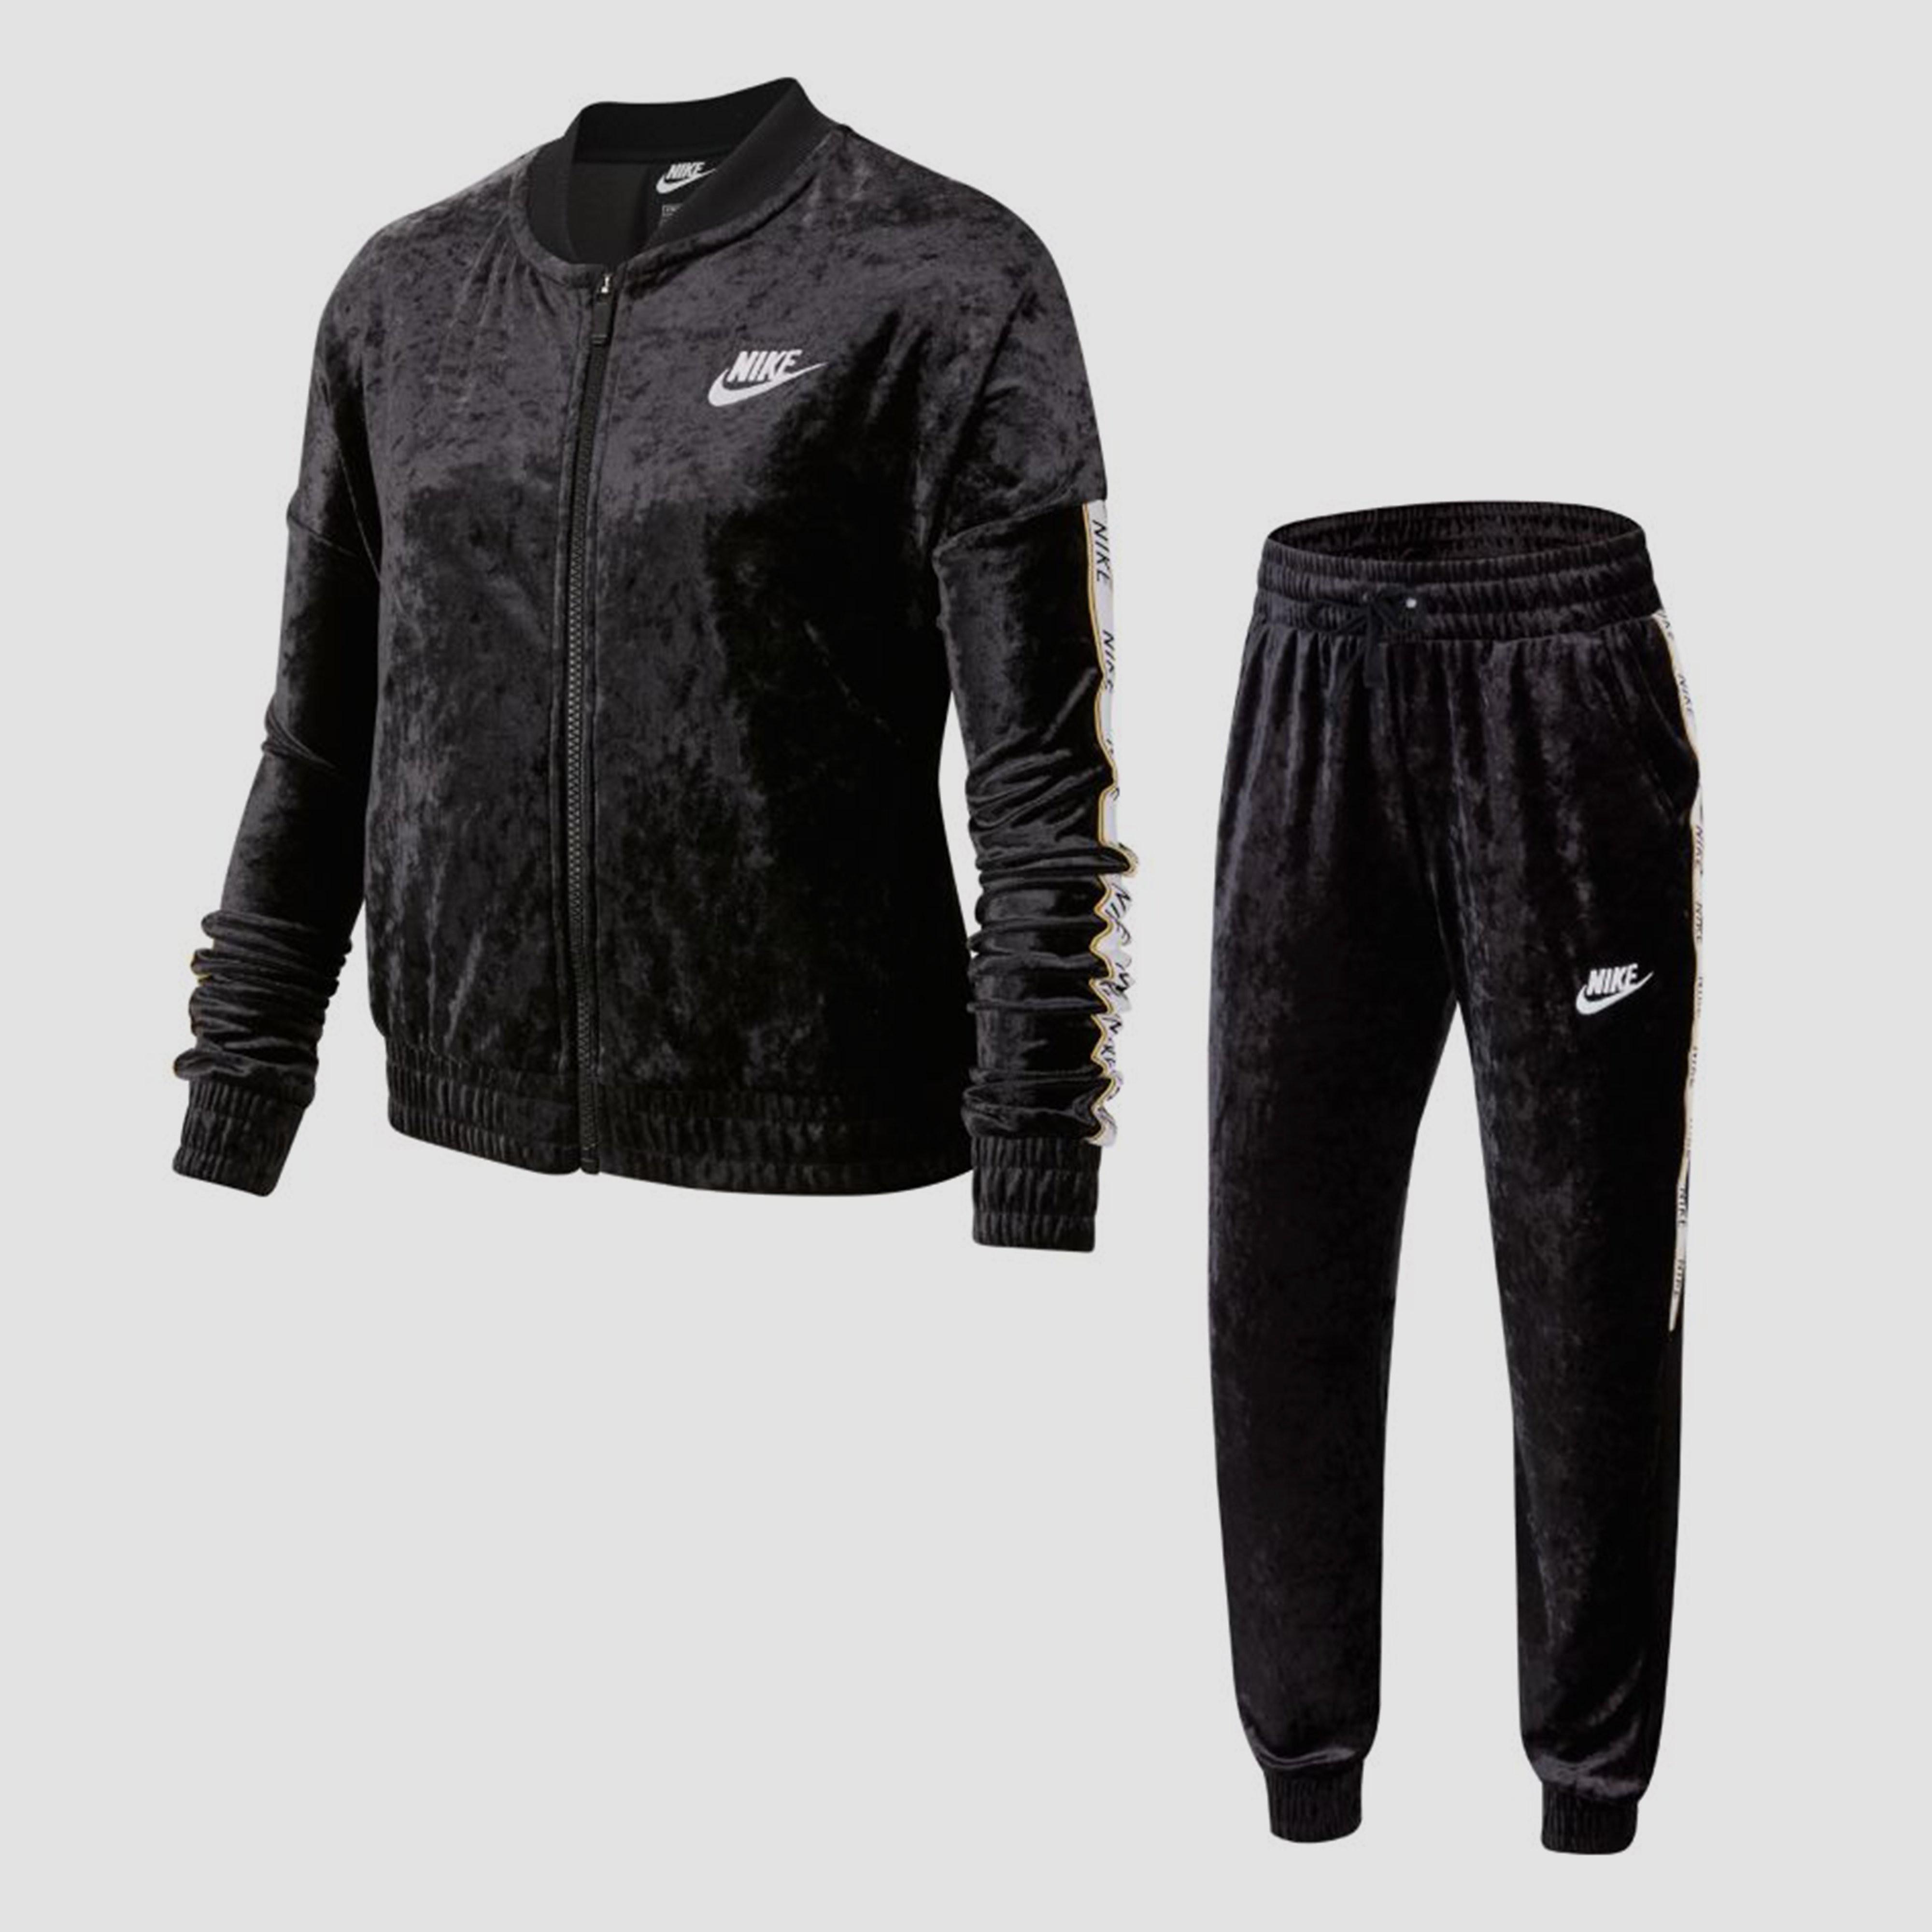 NIKE Sportswear joggingpak zwart kinderen Kinderen